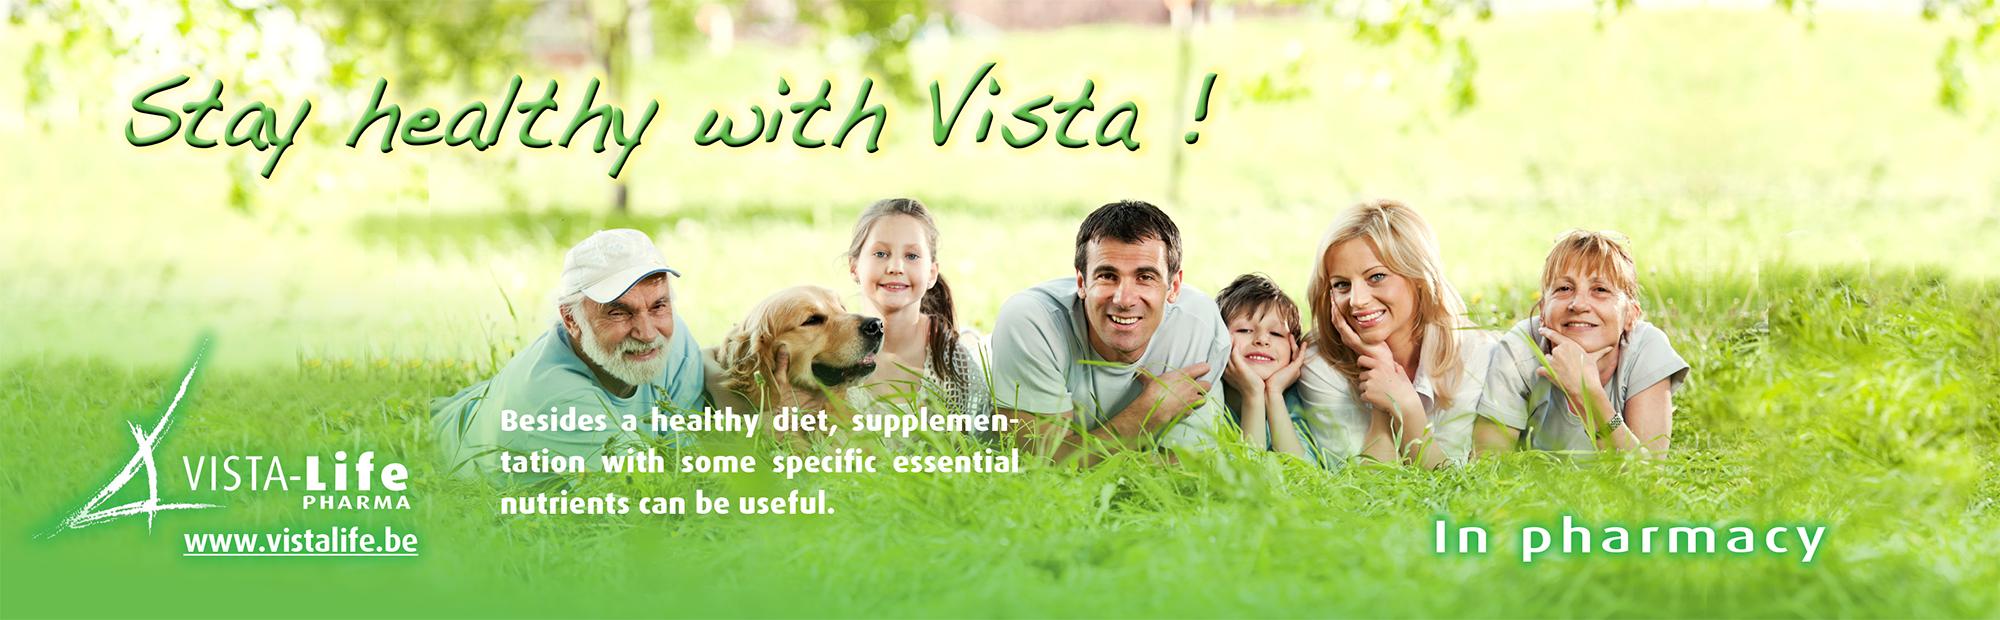 vista-life-pharma-(topbanner)2GB